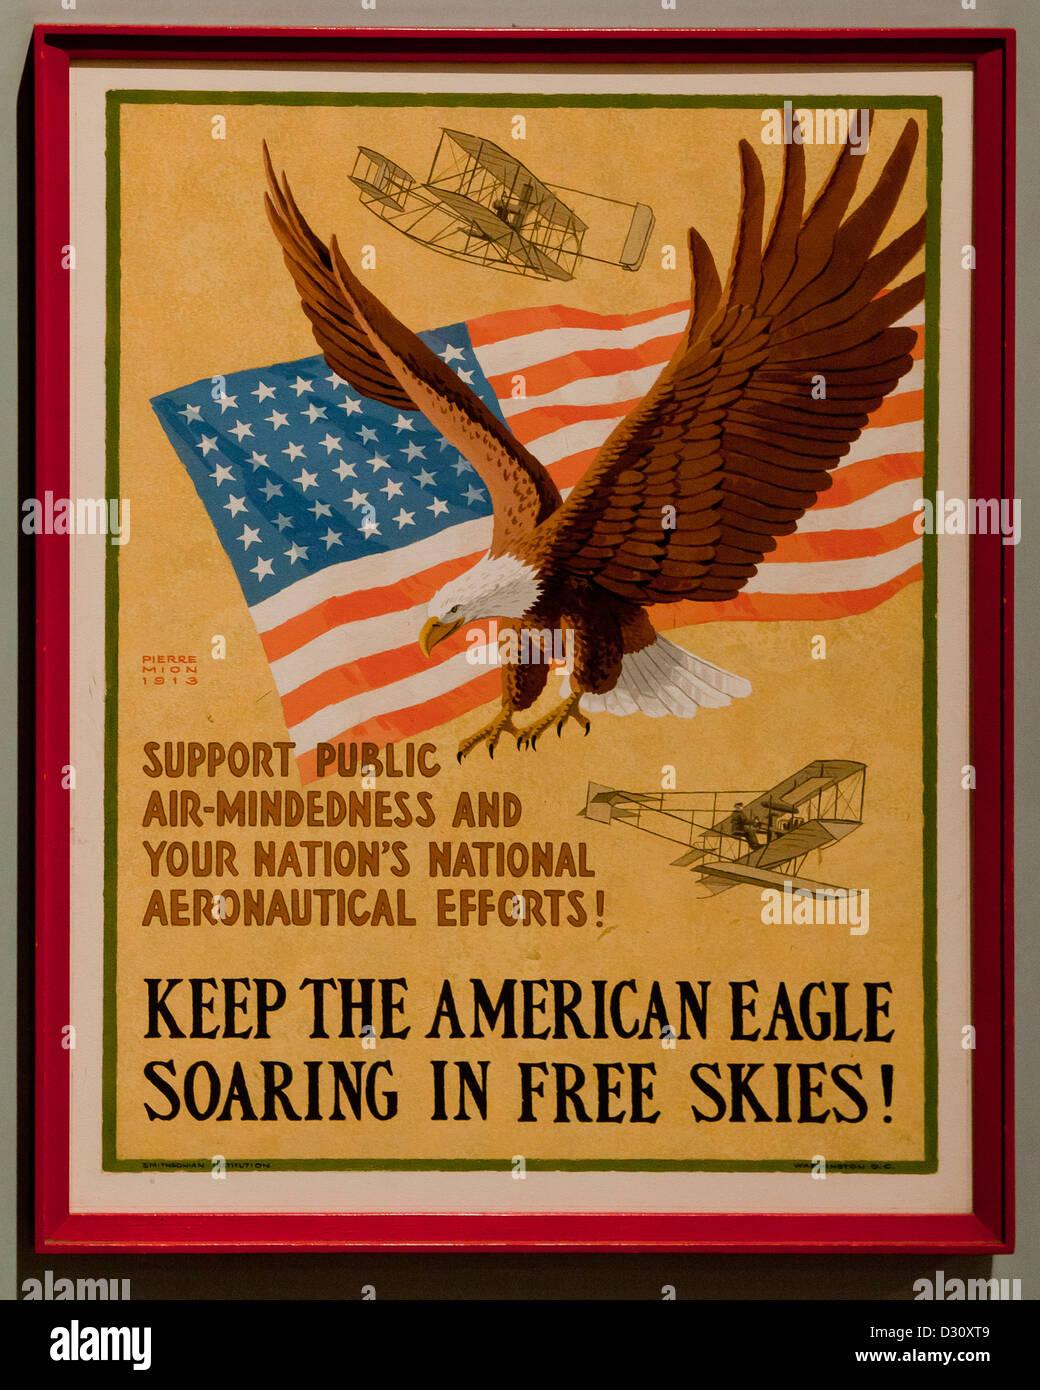 American Eagle National Aeronautics campaign poster - USA - Stock Image